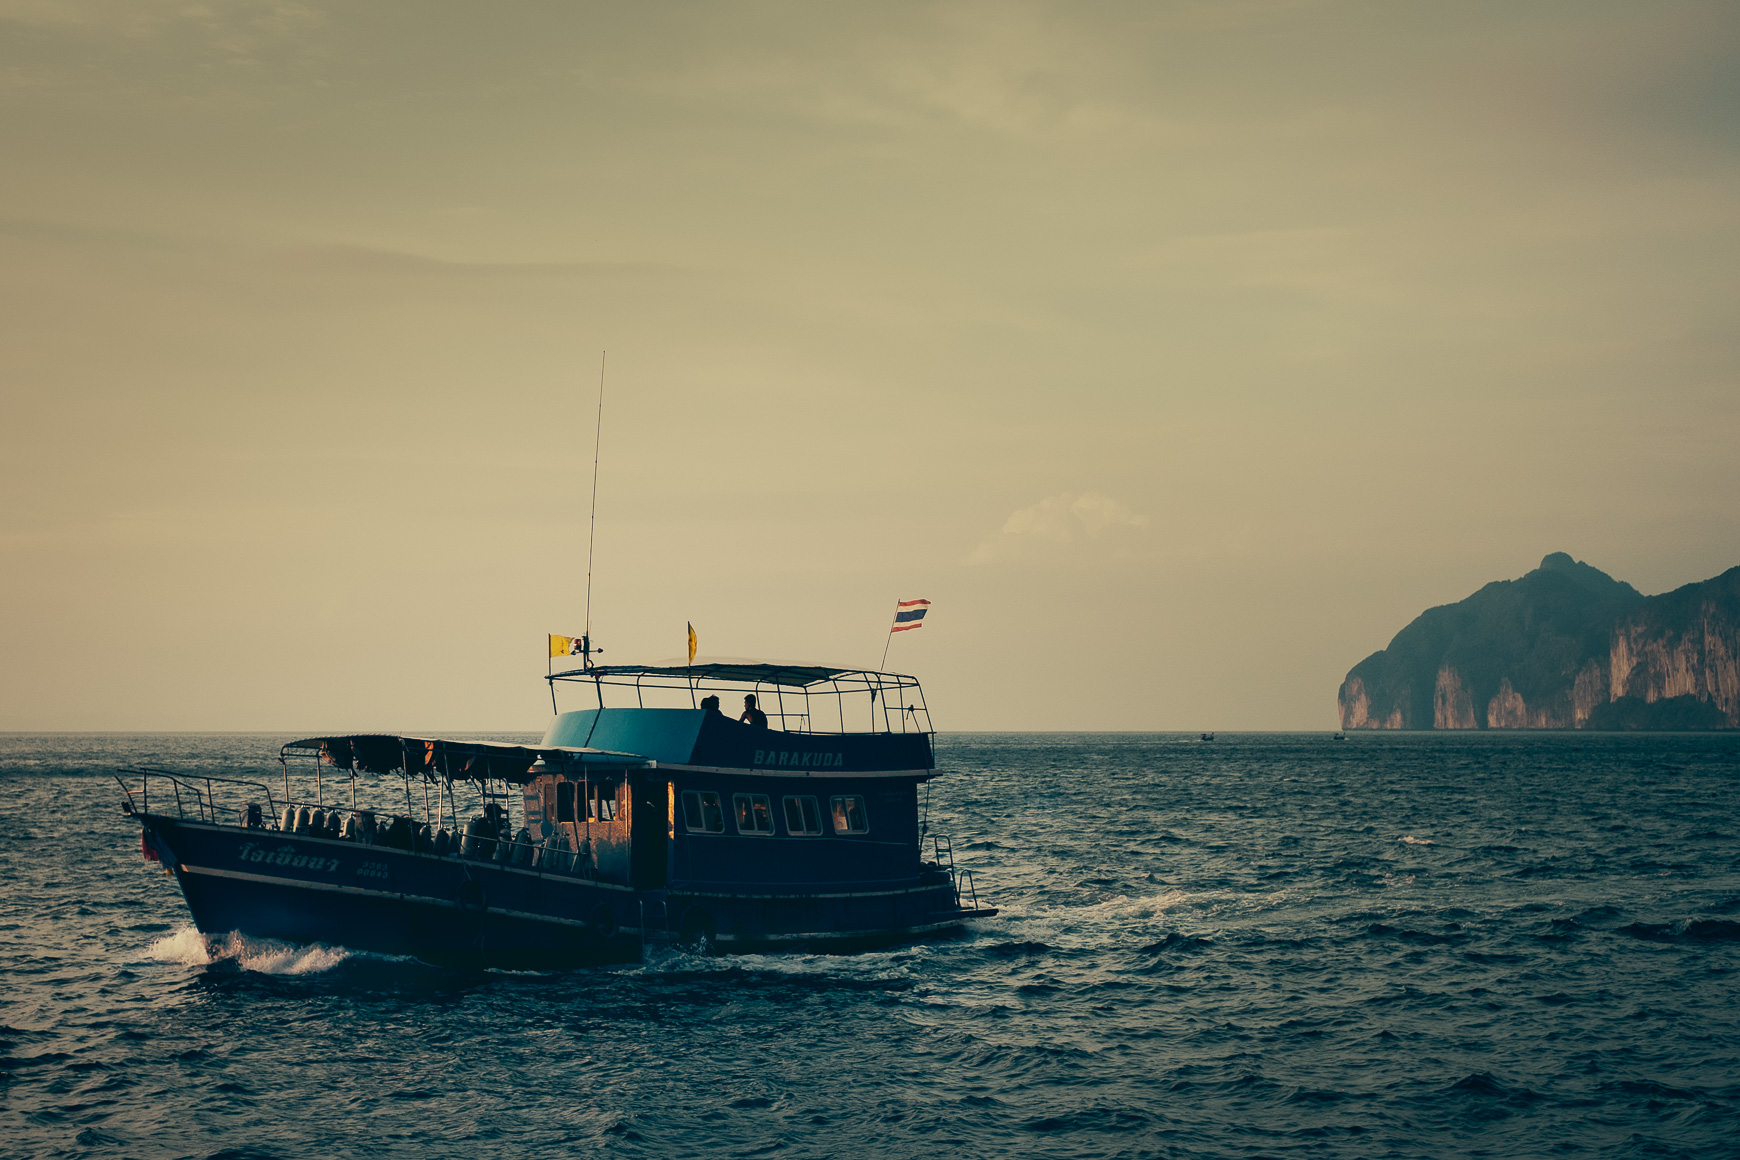 Phi_Phi_Boat.jpg